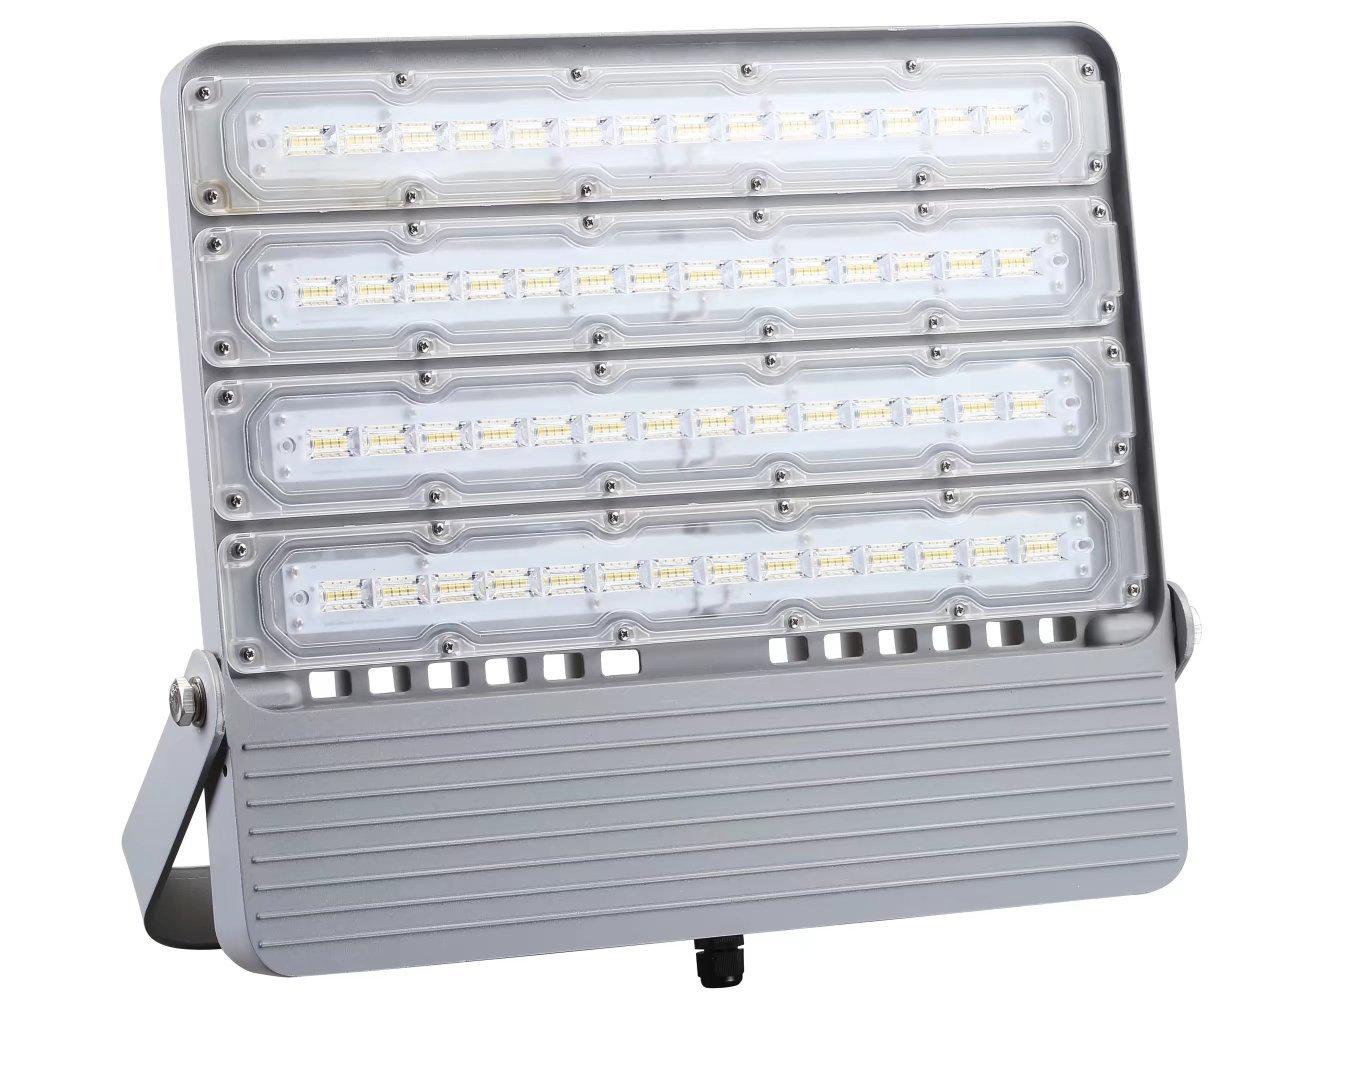 200W LED Flood Light,Super Bright,New Craft,IP66 Waterproof,1500 Watt Halogen Bulb Equivalent, 23000Lm, Warm White 3000K, Outdoor Floodlight Fixtures